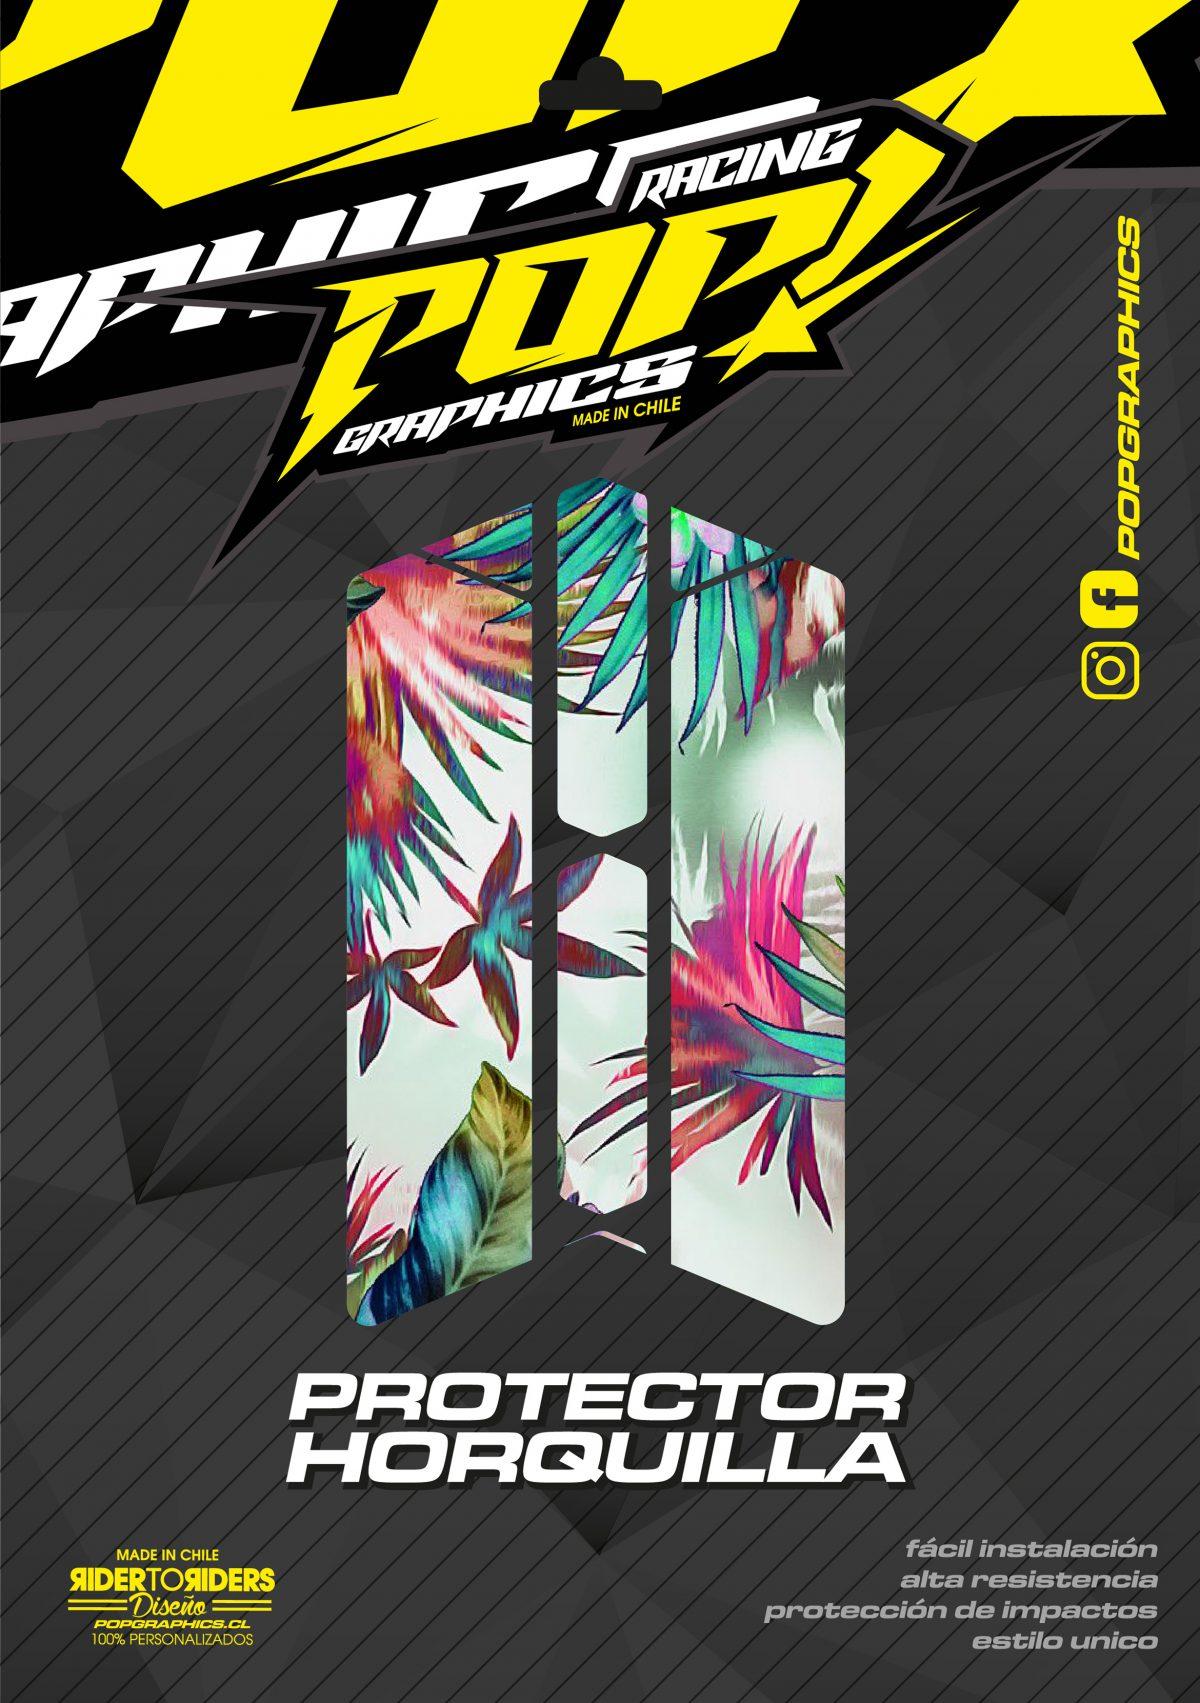 Protector horquilla flores